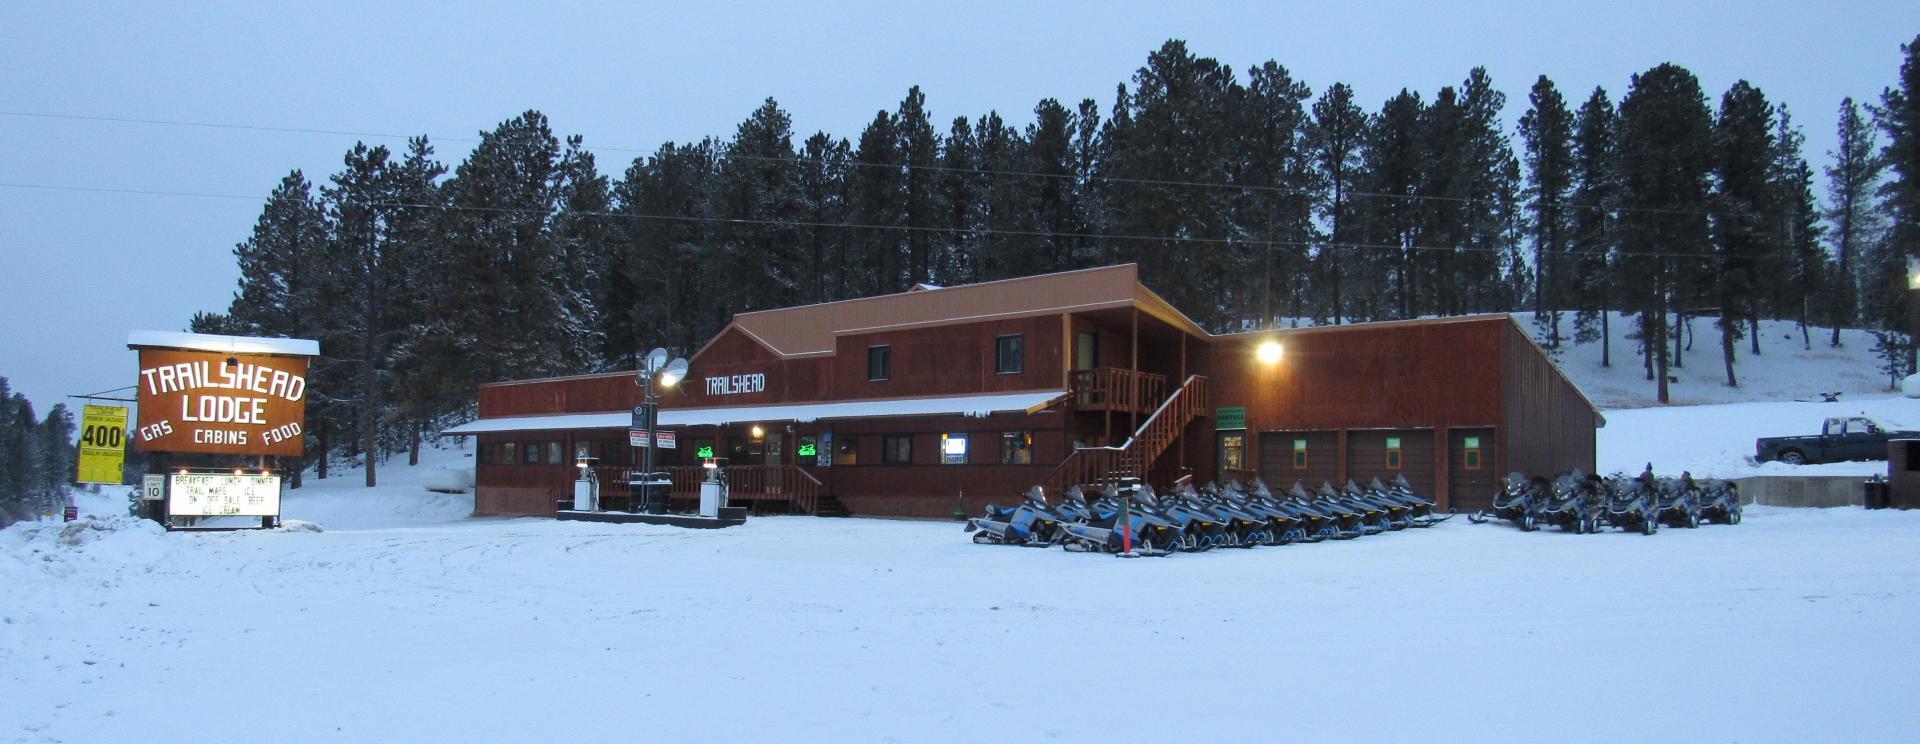 Trailshead Lodge Rentals